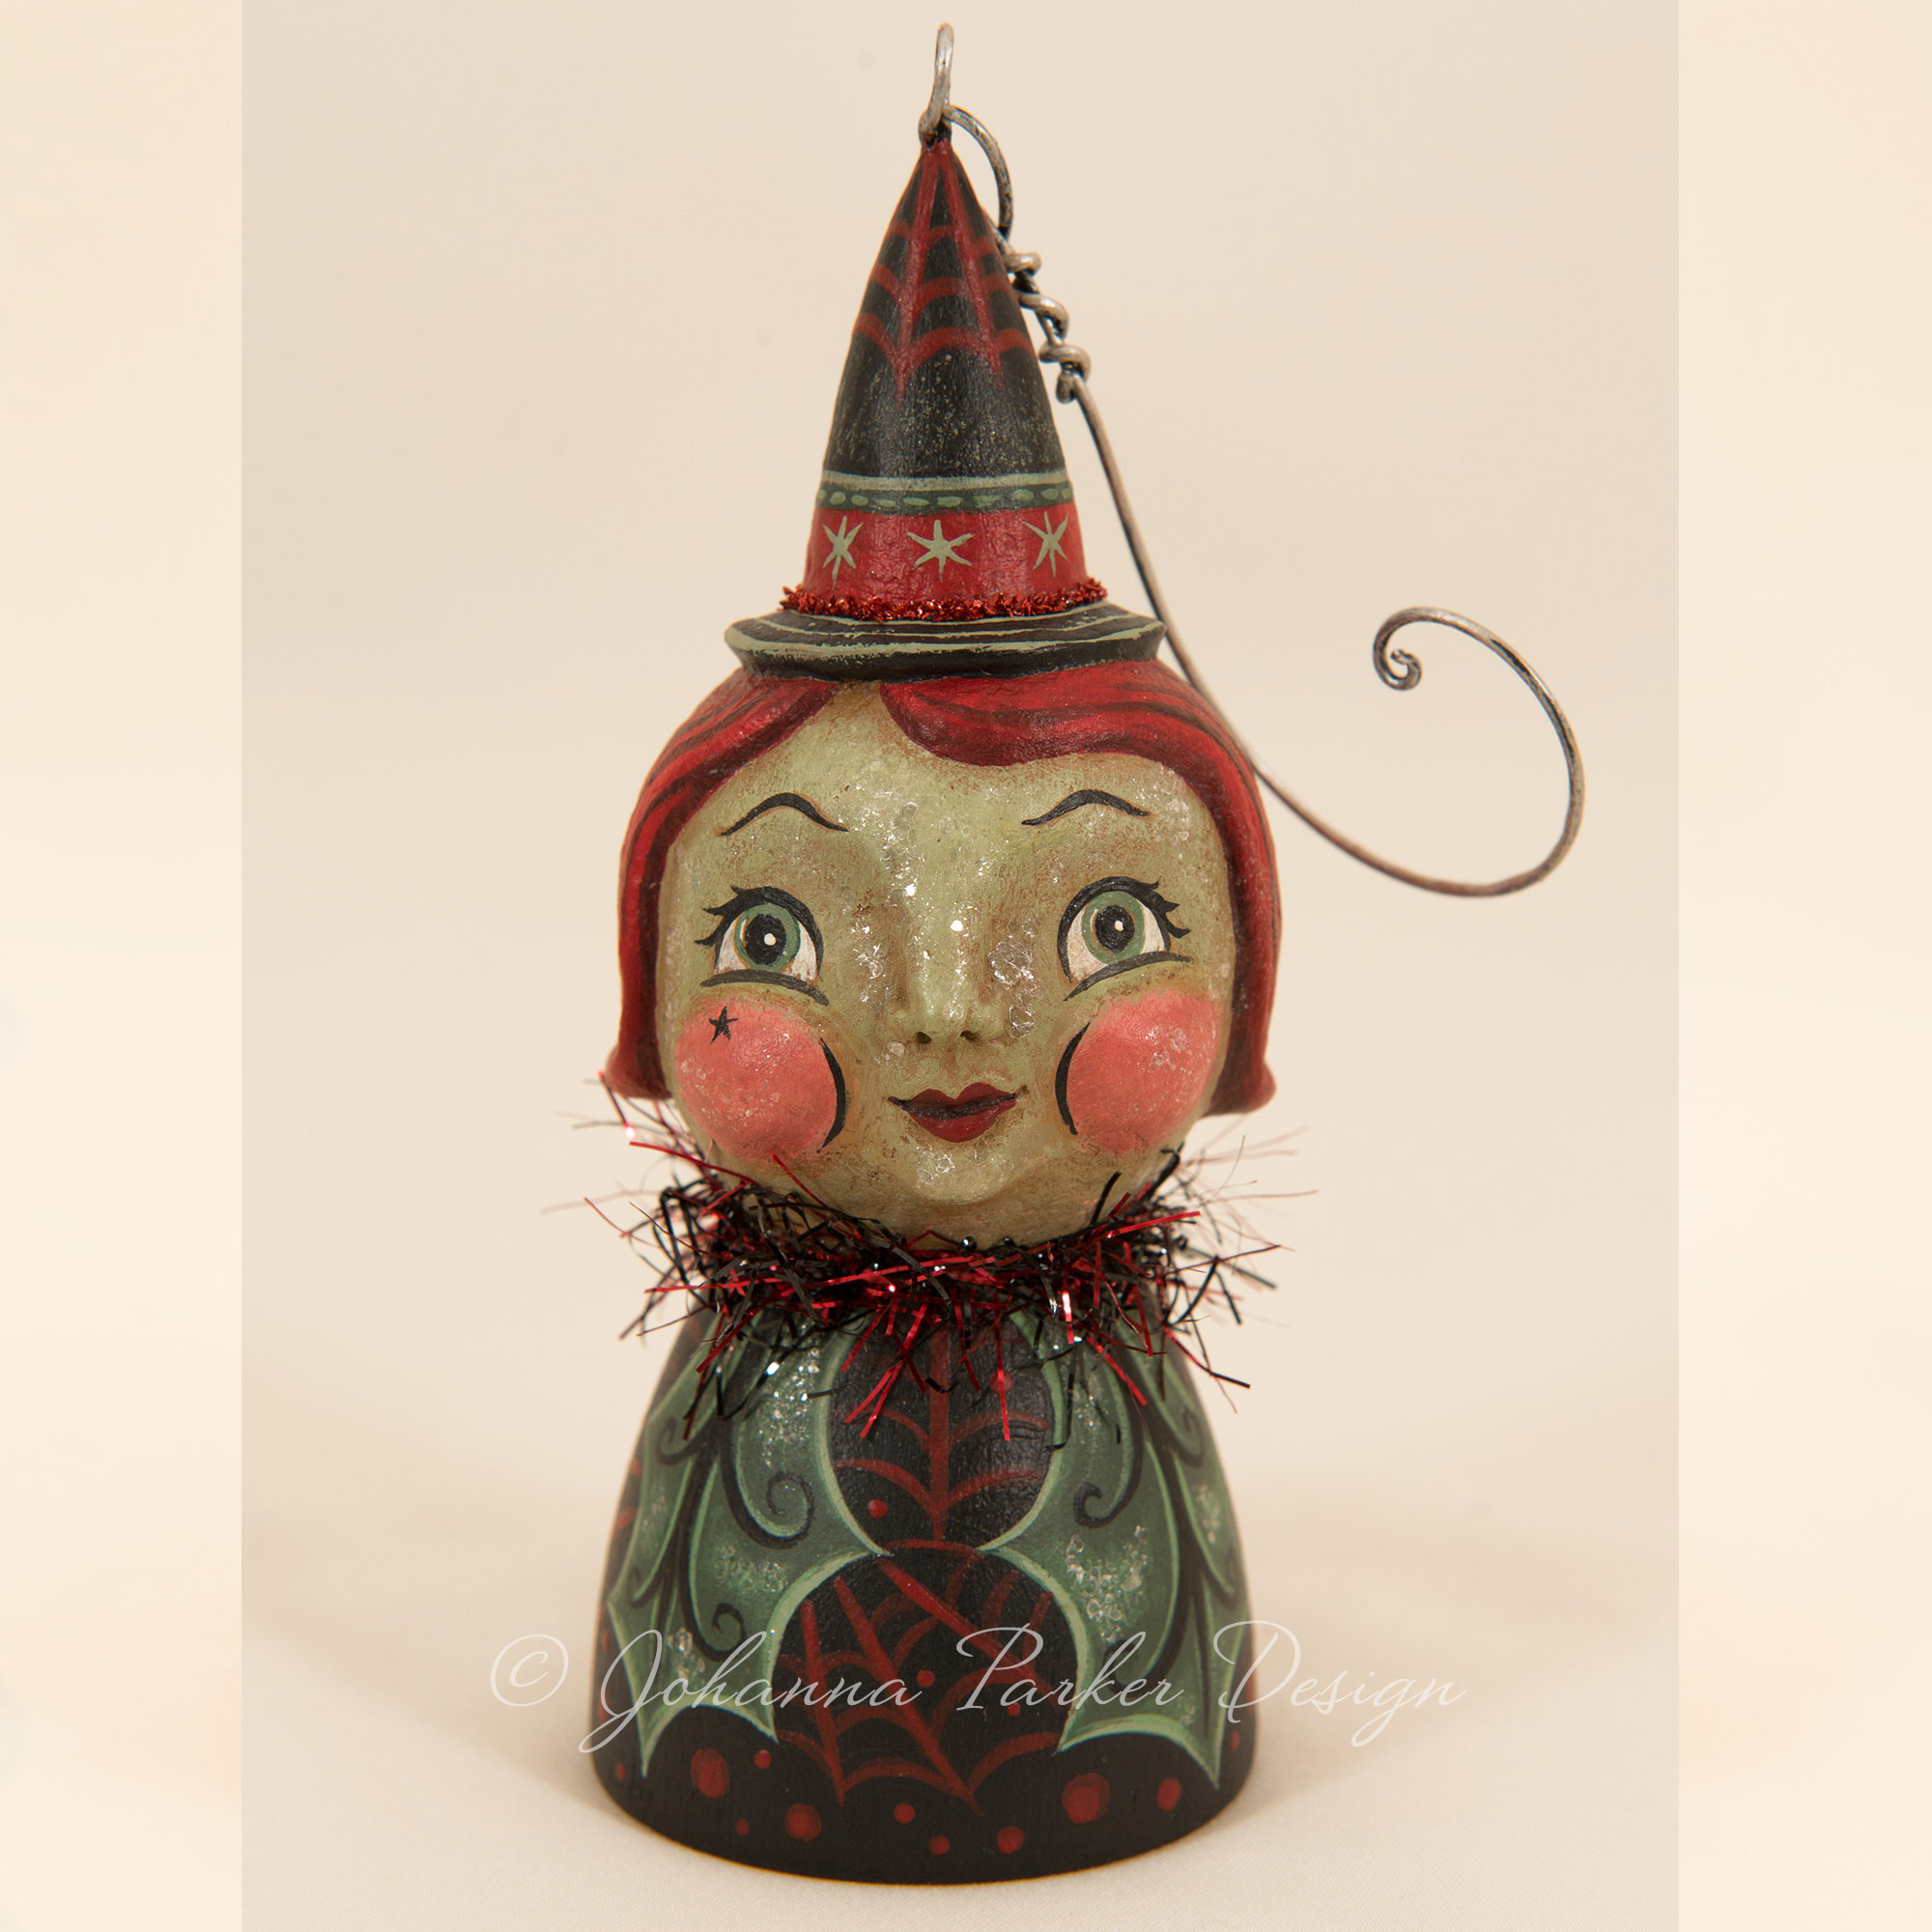 Johanna-Parker-Holly-Witch-Bell-Ornament-1.jpg